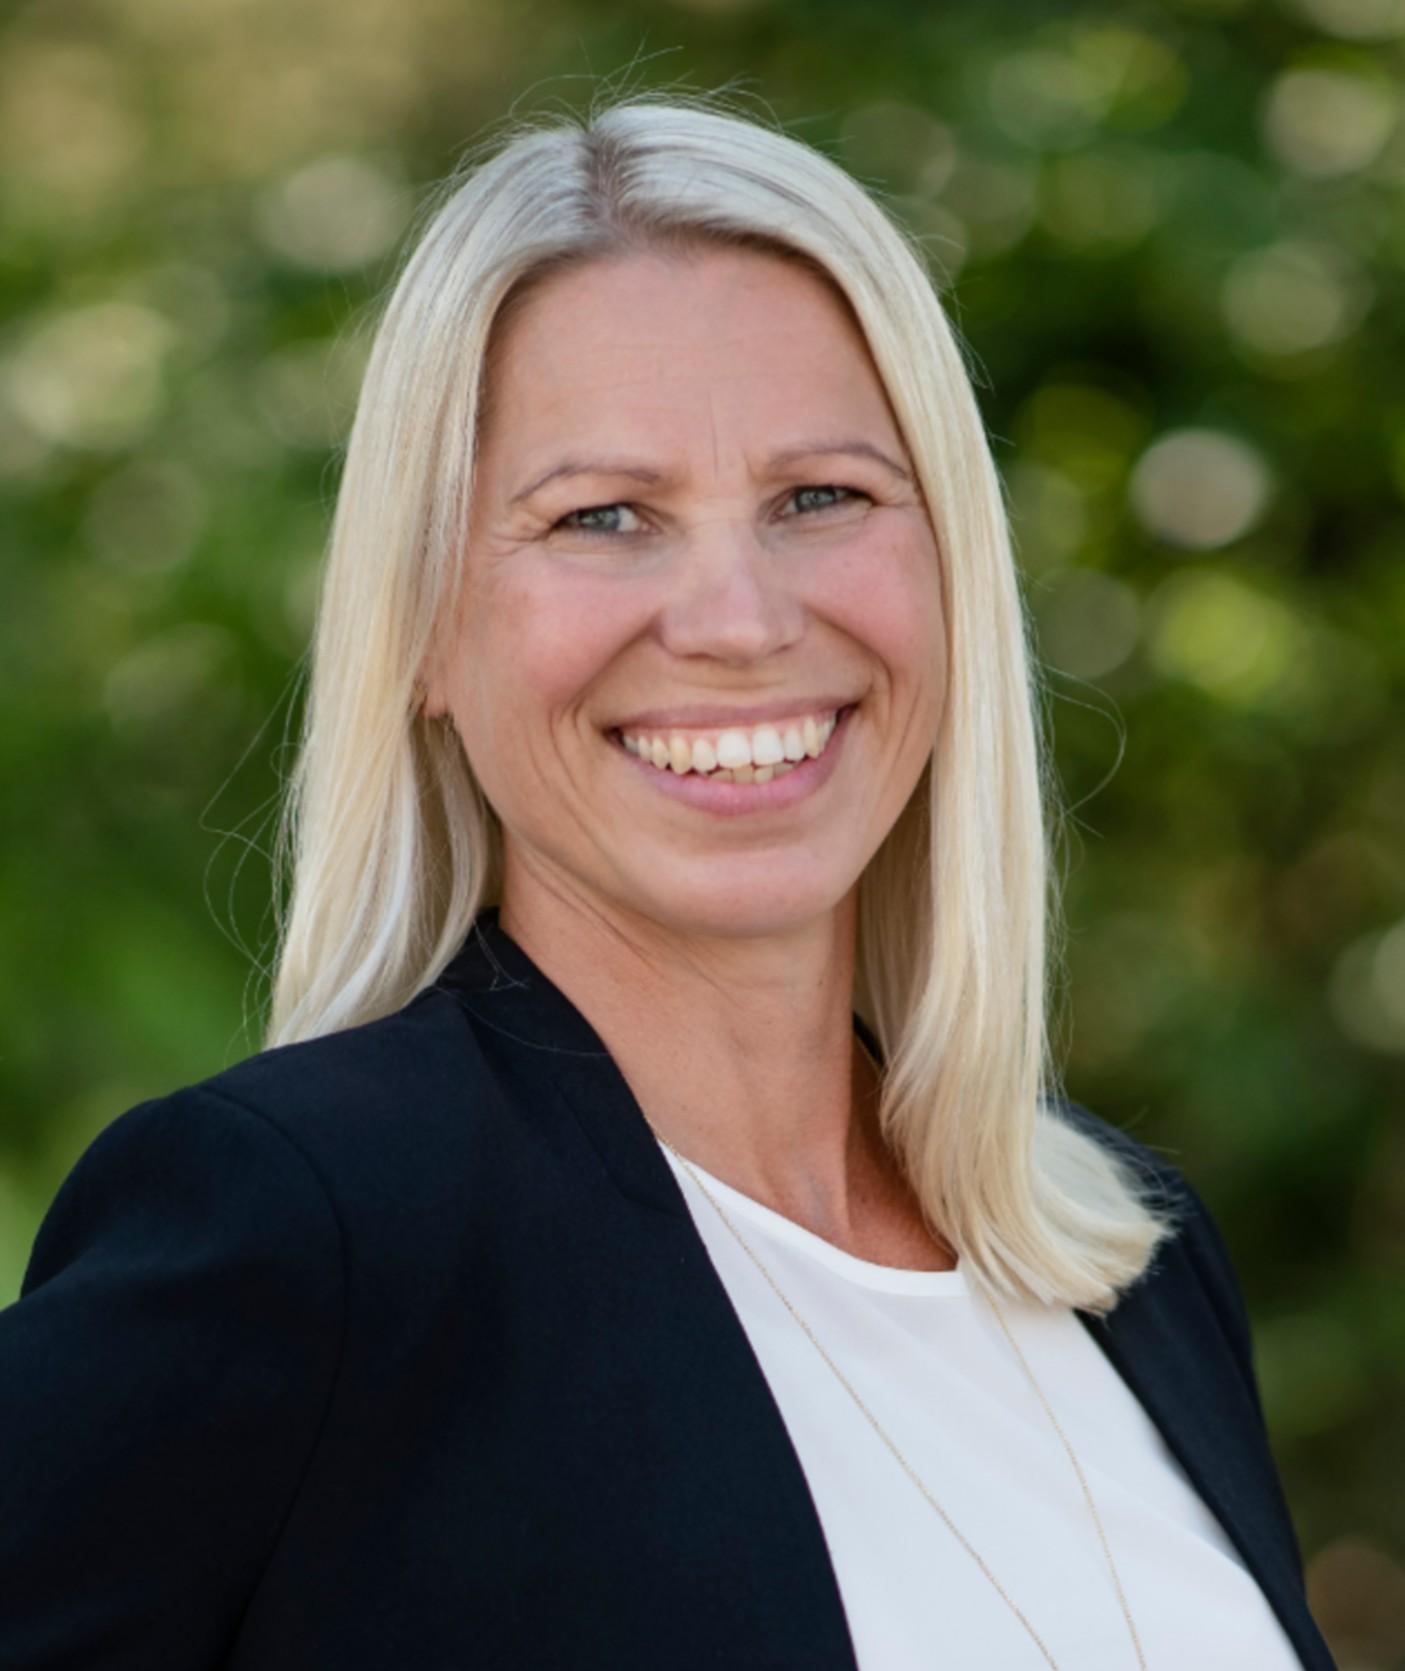 Annica Rönnbäck, Quretech Bio